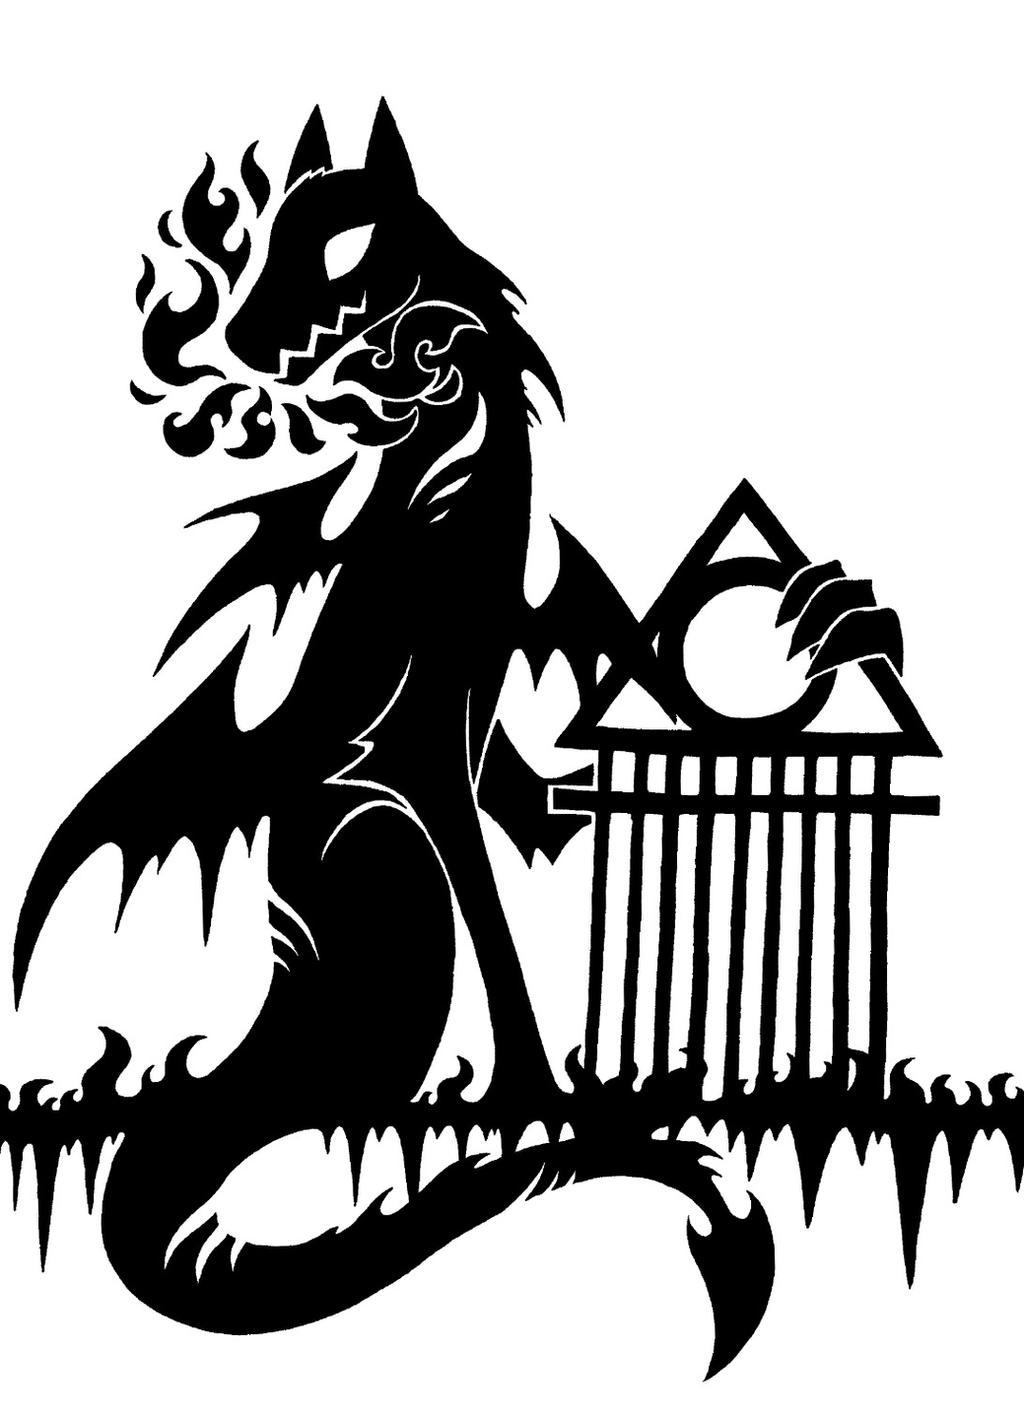 dragon_fredrick_02_by_sunnyparallax-d830ygq.jpg